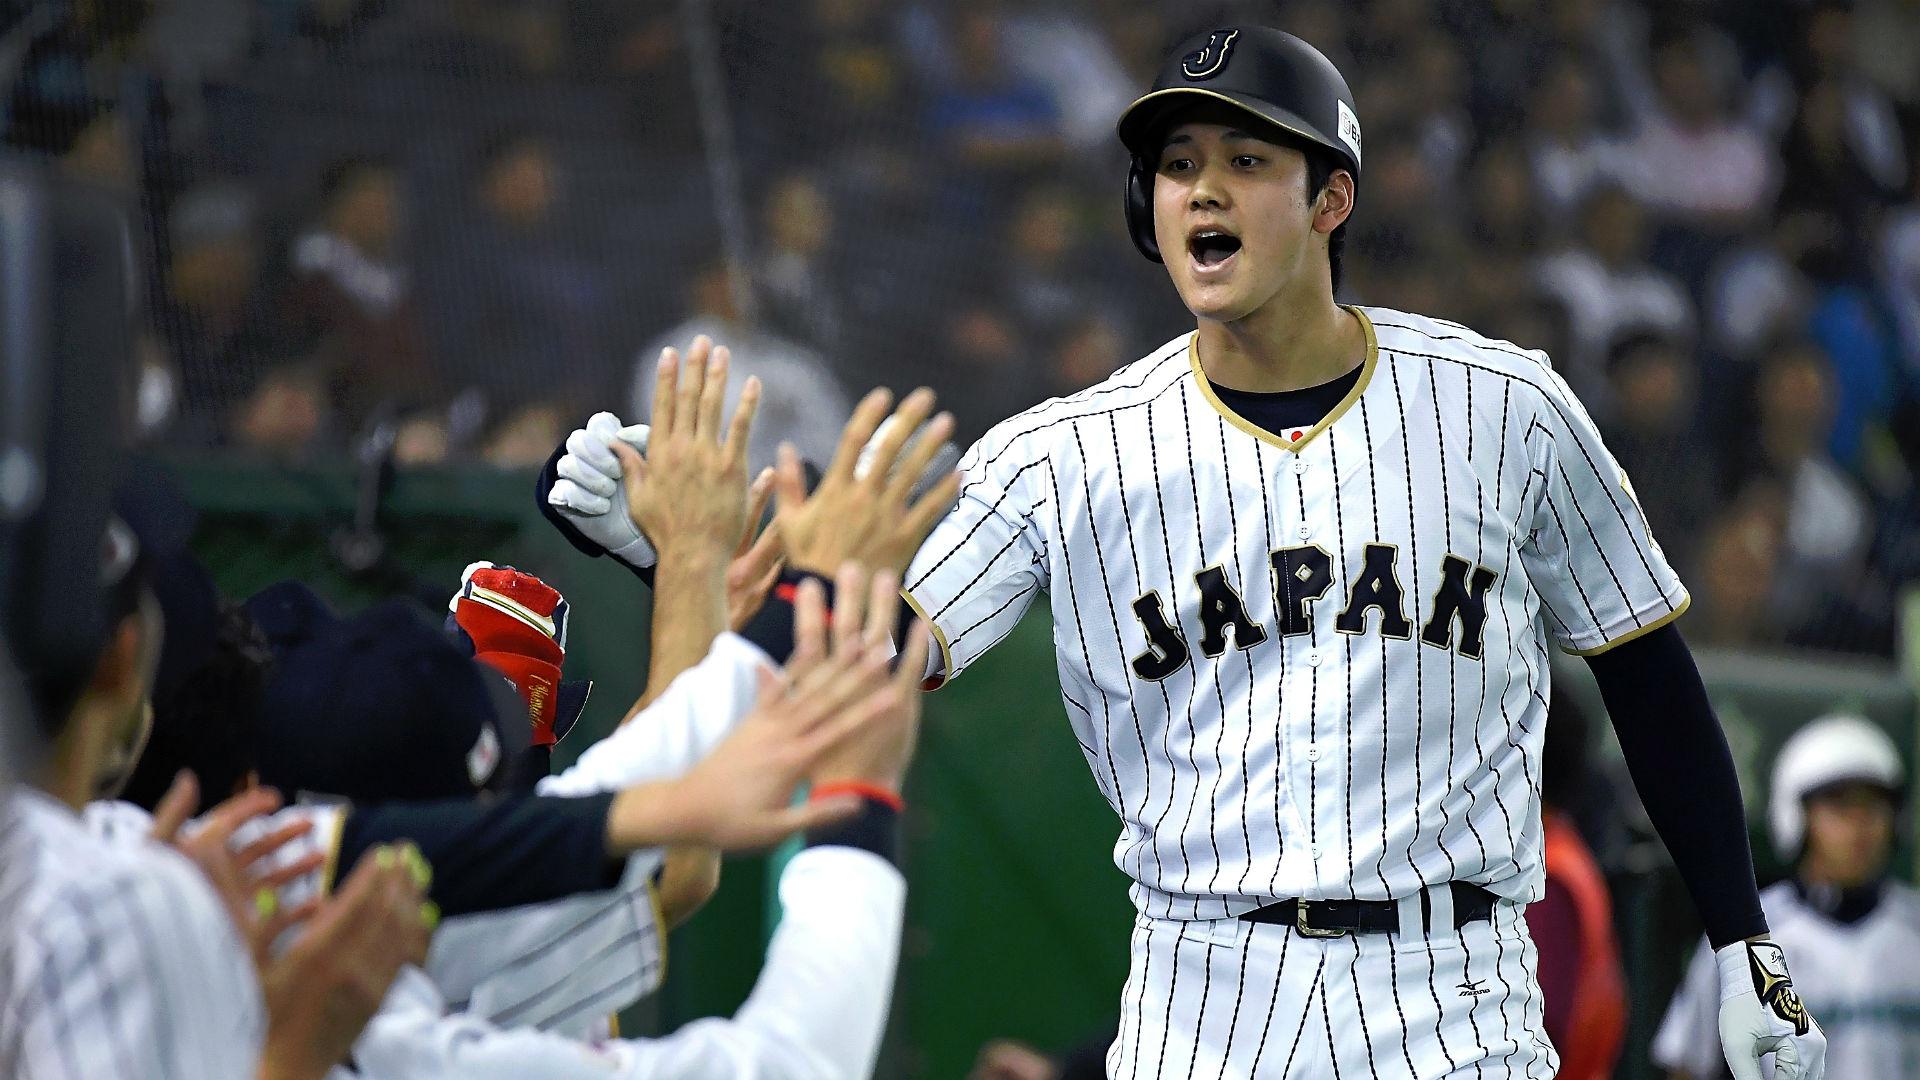 Shohei-ohtani-japon-vs-holanda-amistoso-internacional-12112016_48csu8qc4anq1c8tjzwelj2gk